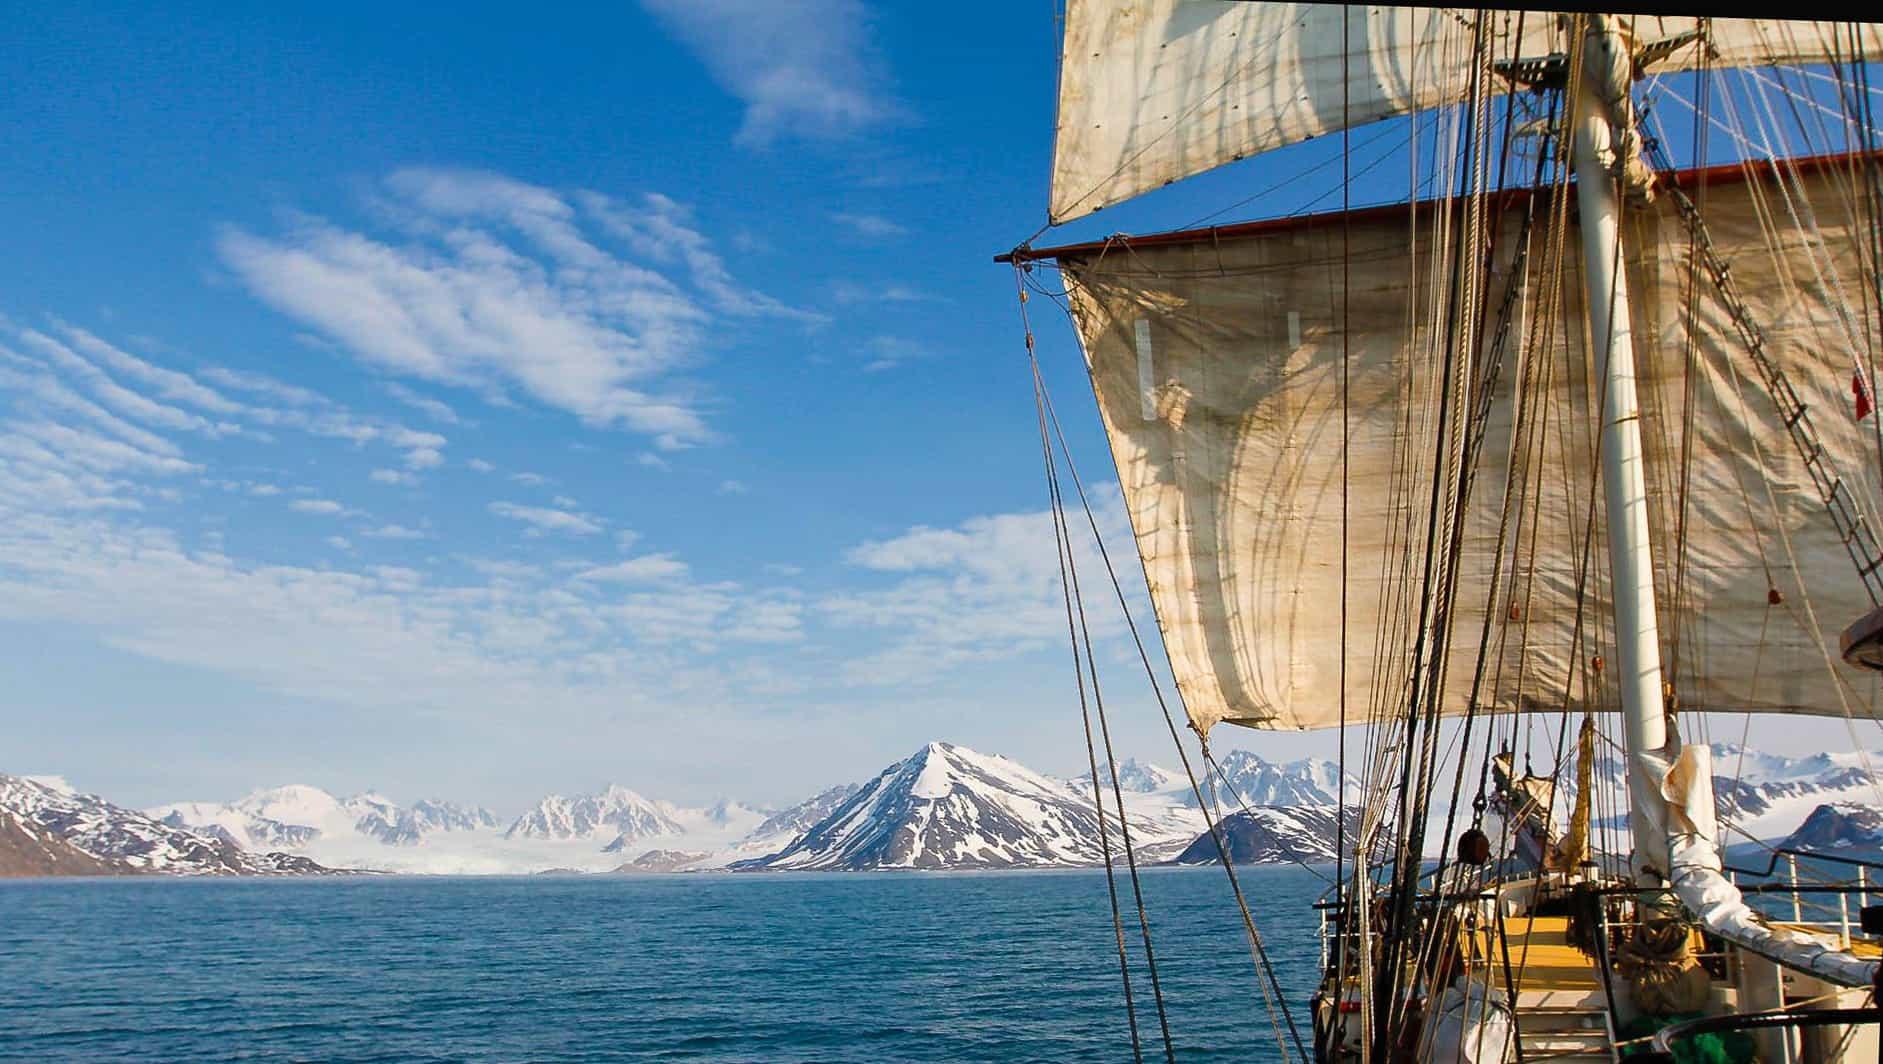 Tall ship Antigua sailing in Svalbard